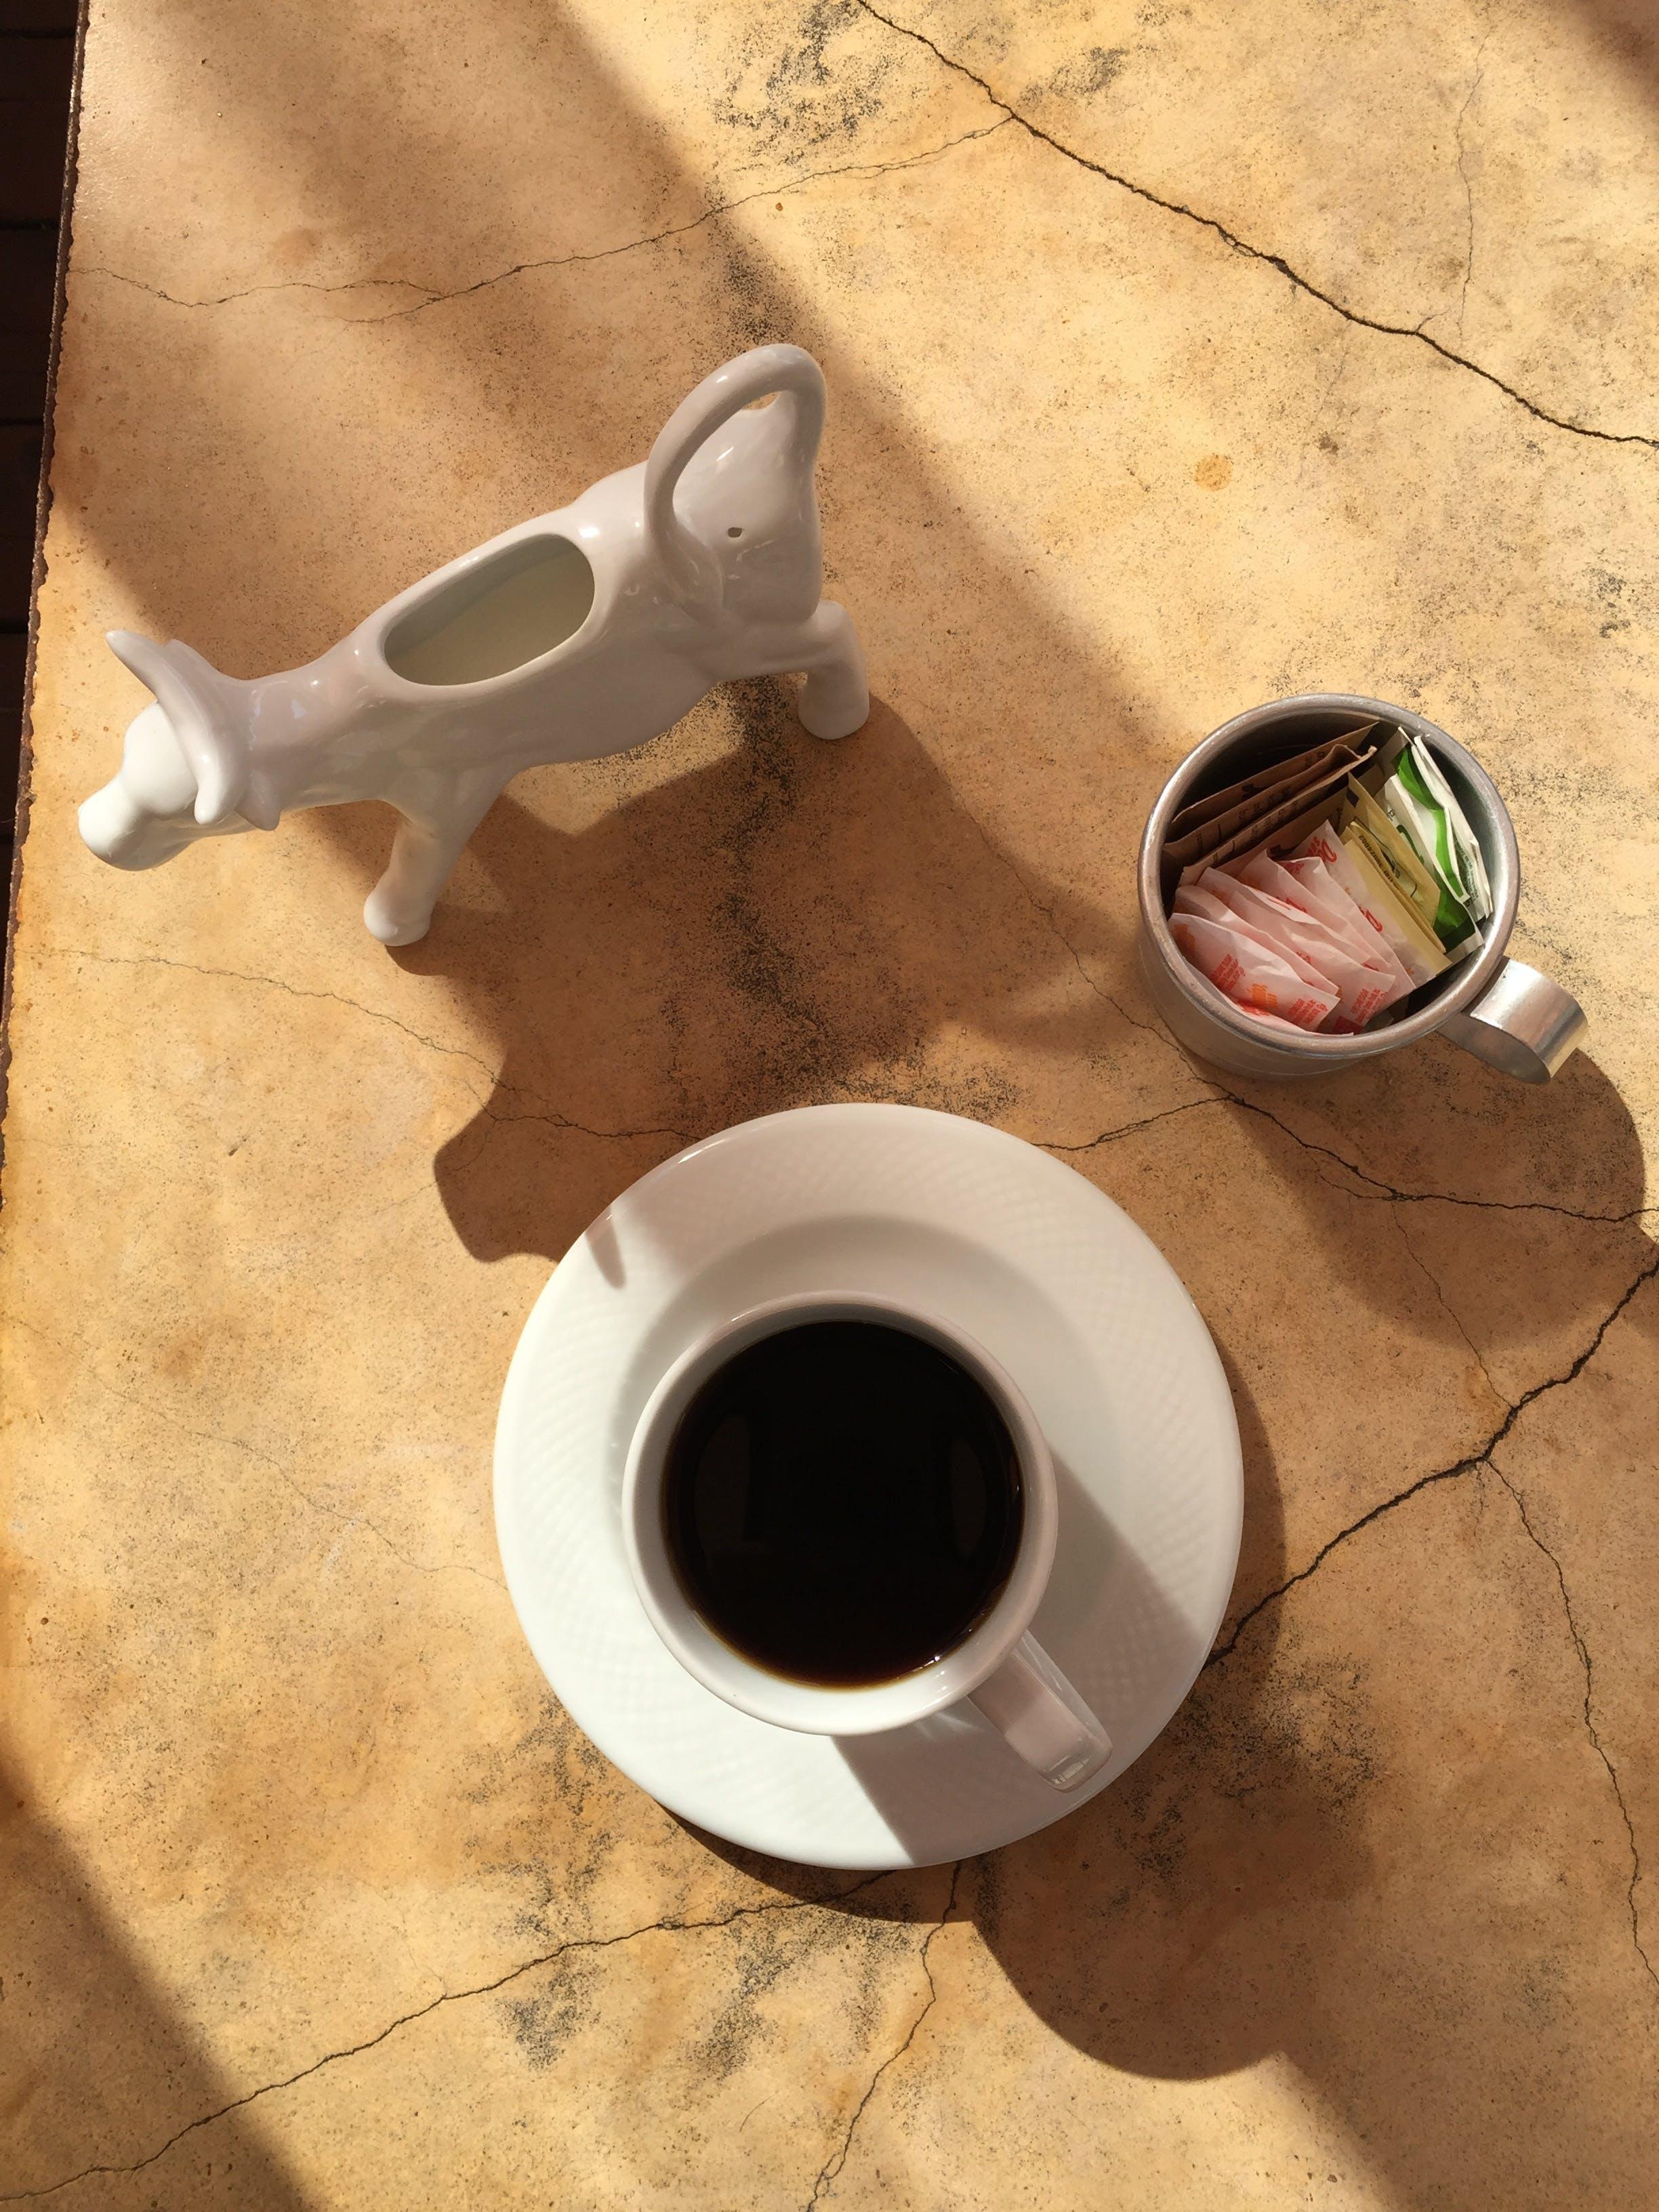 Free stock photo of coffee, table, morning, cream